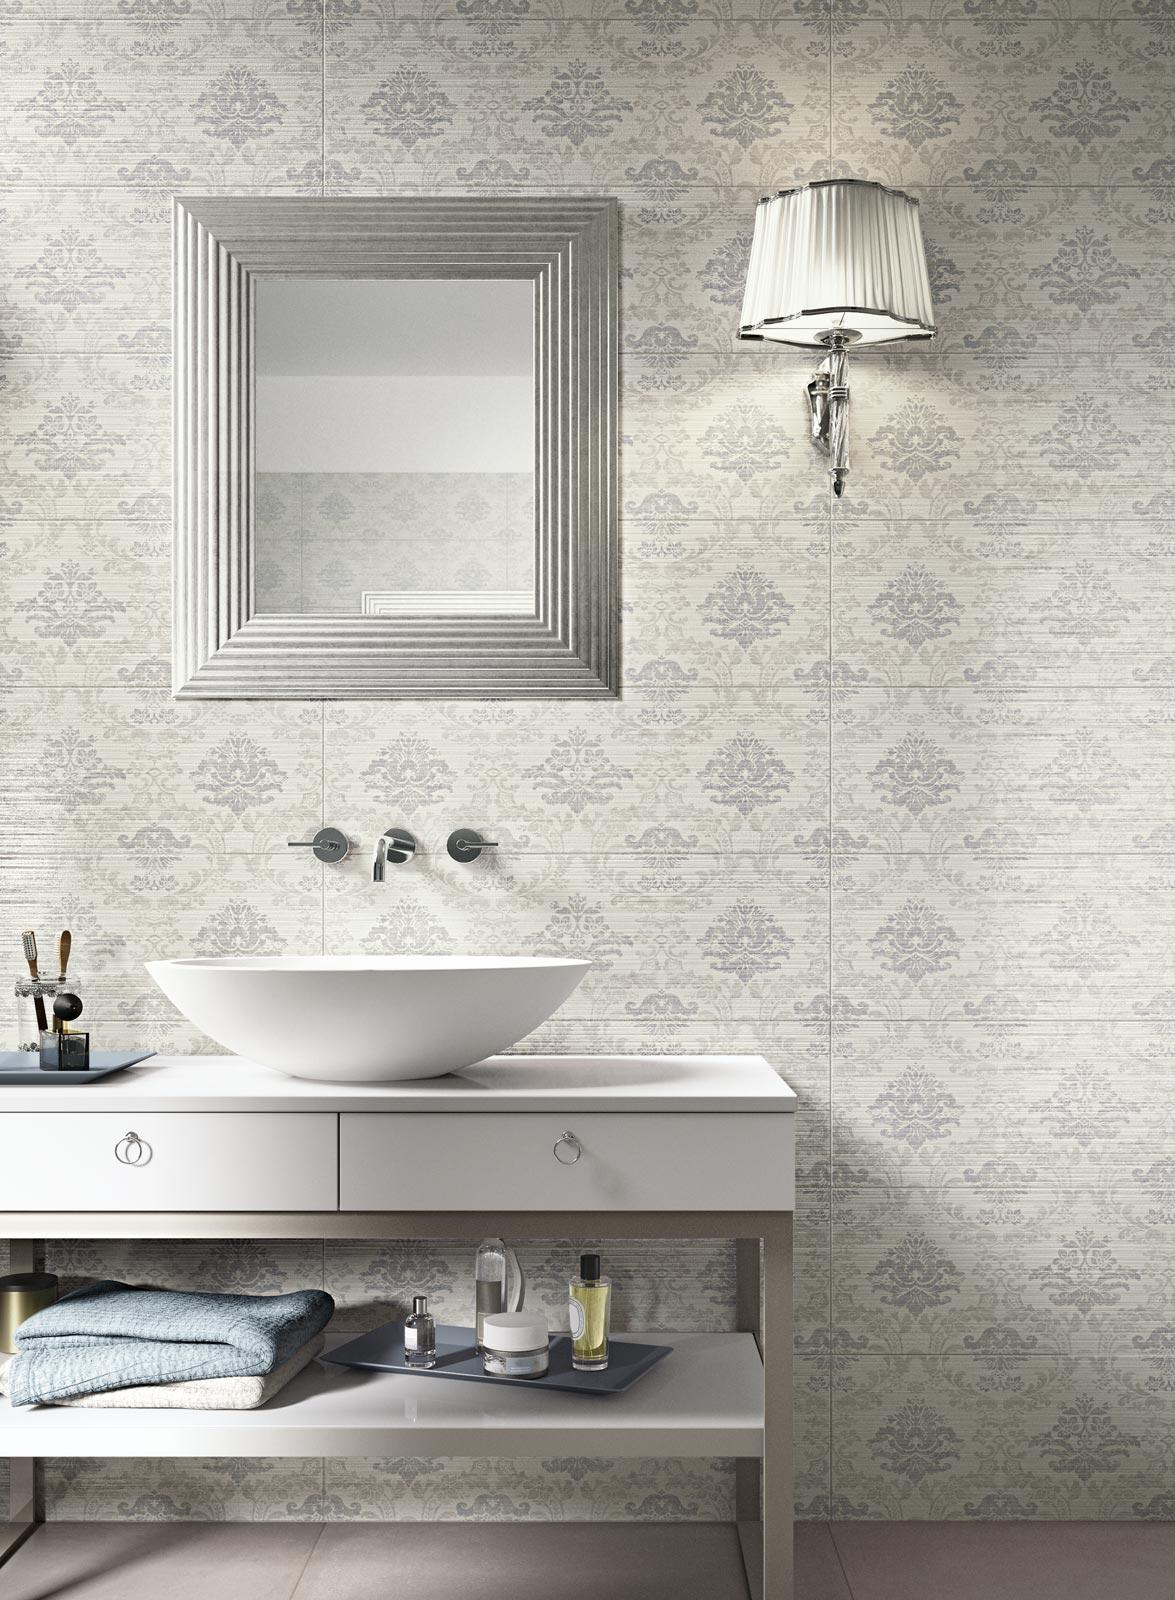 Bathroom Tile Wallpaper Wallpaper Collection Elegatanotnt Tiles For Walls And Bathrooms Ragno